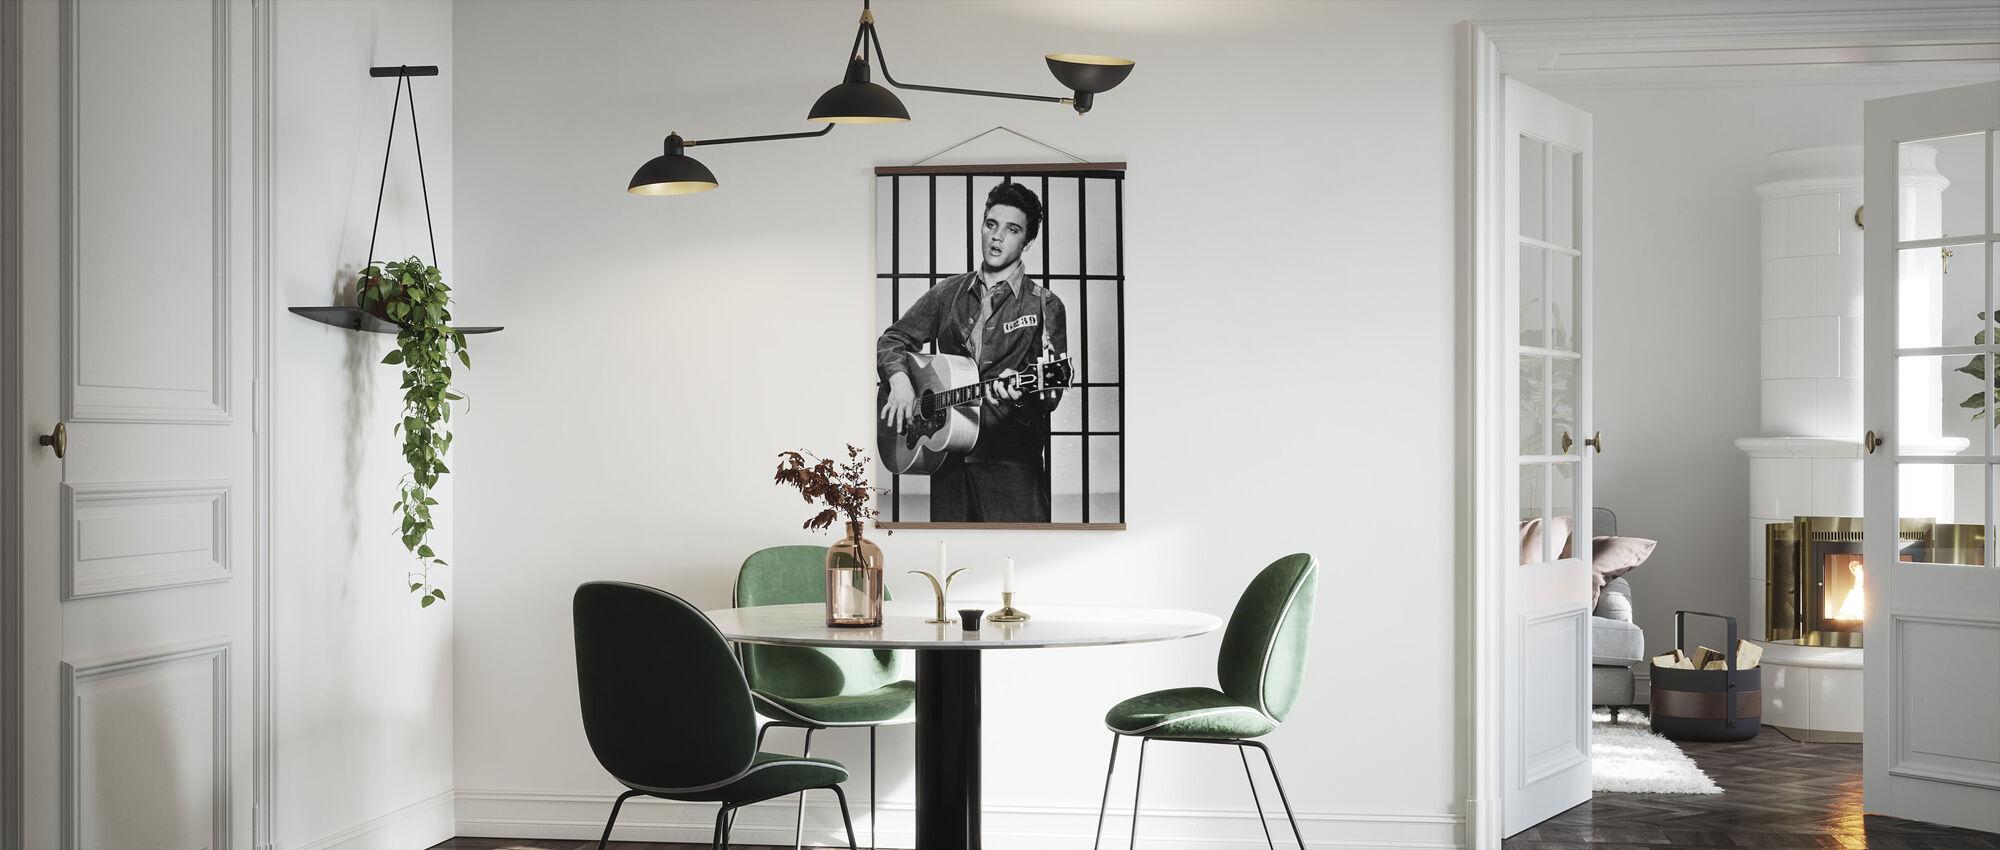 Elvis Presley en Jailhouse Rock - Poster - Keuken